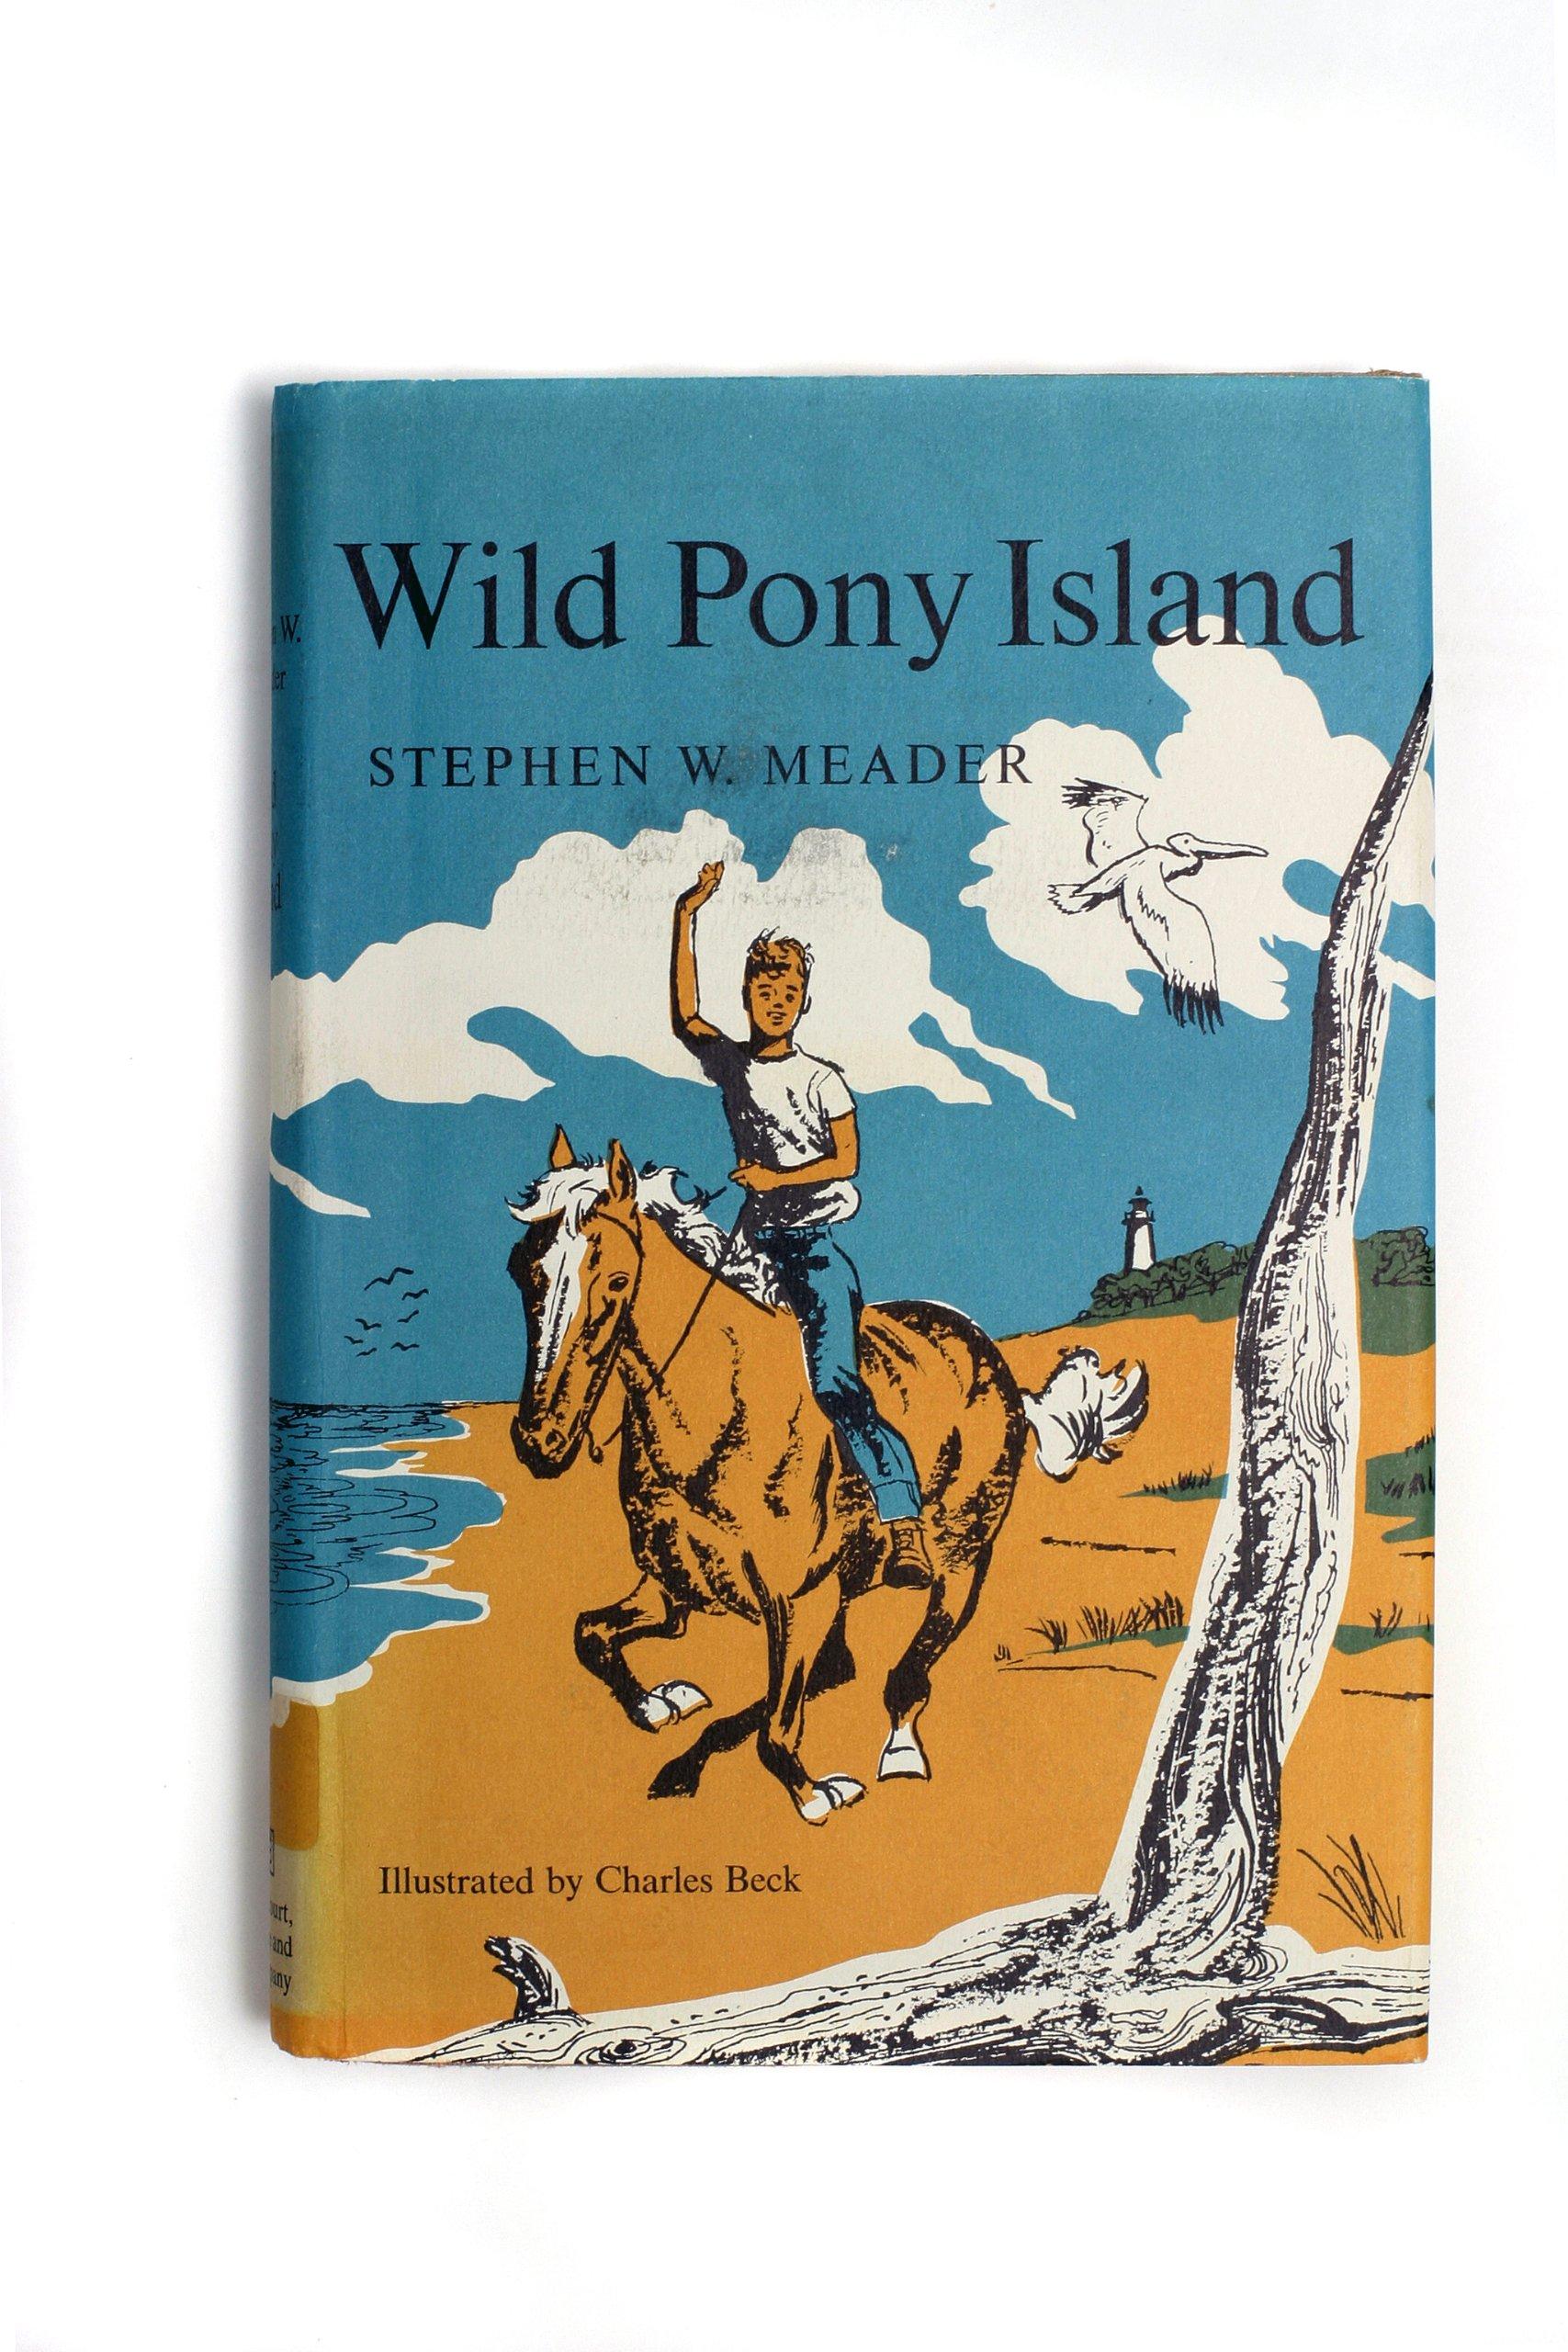 Wild Pony Island: Stephen Meader: 9781931177443: Amazon.com: Books